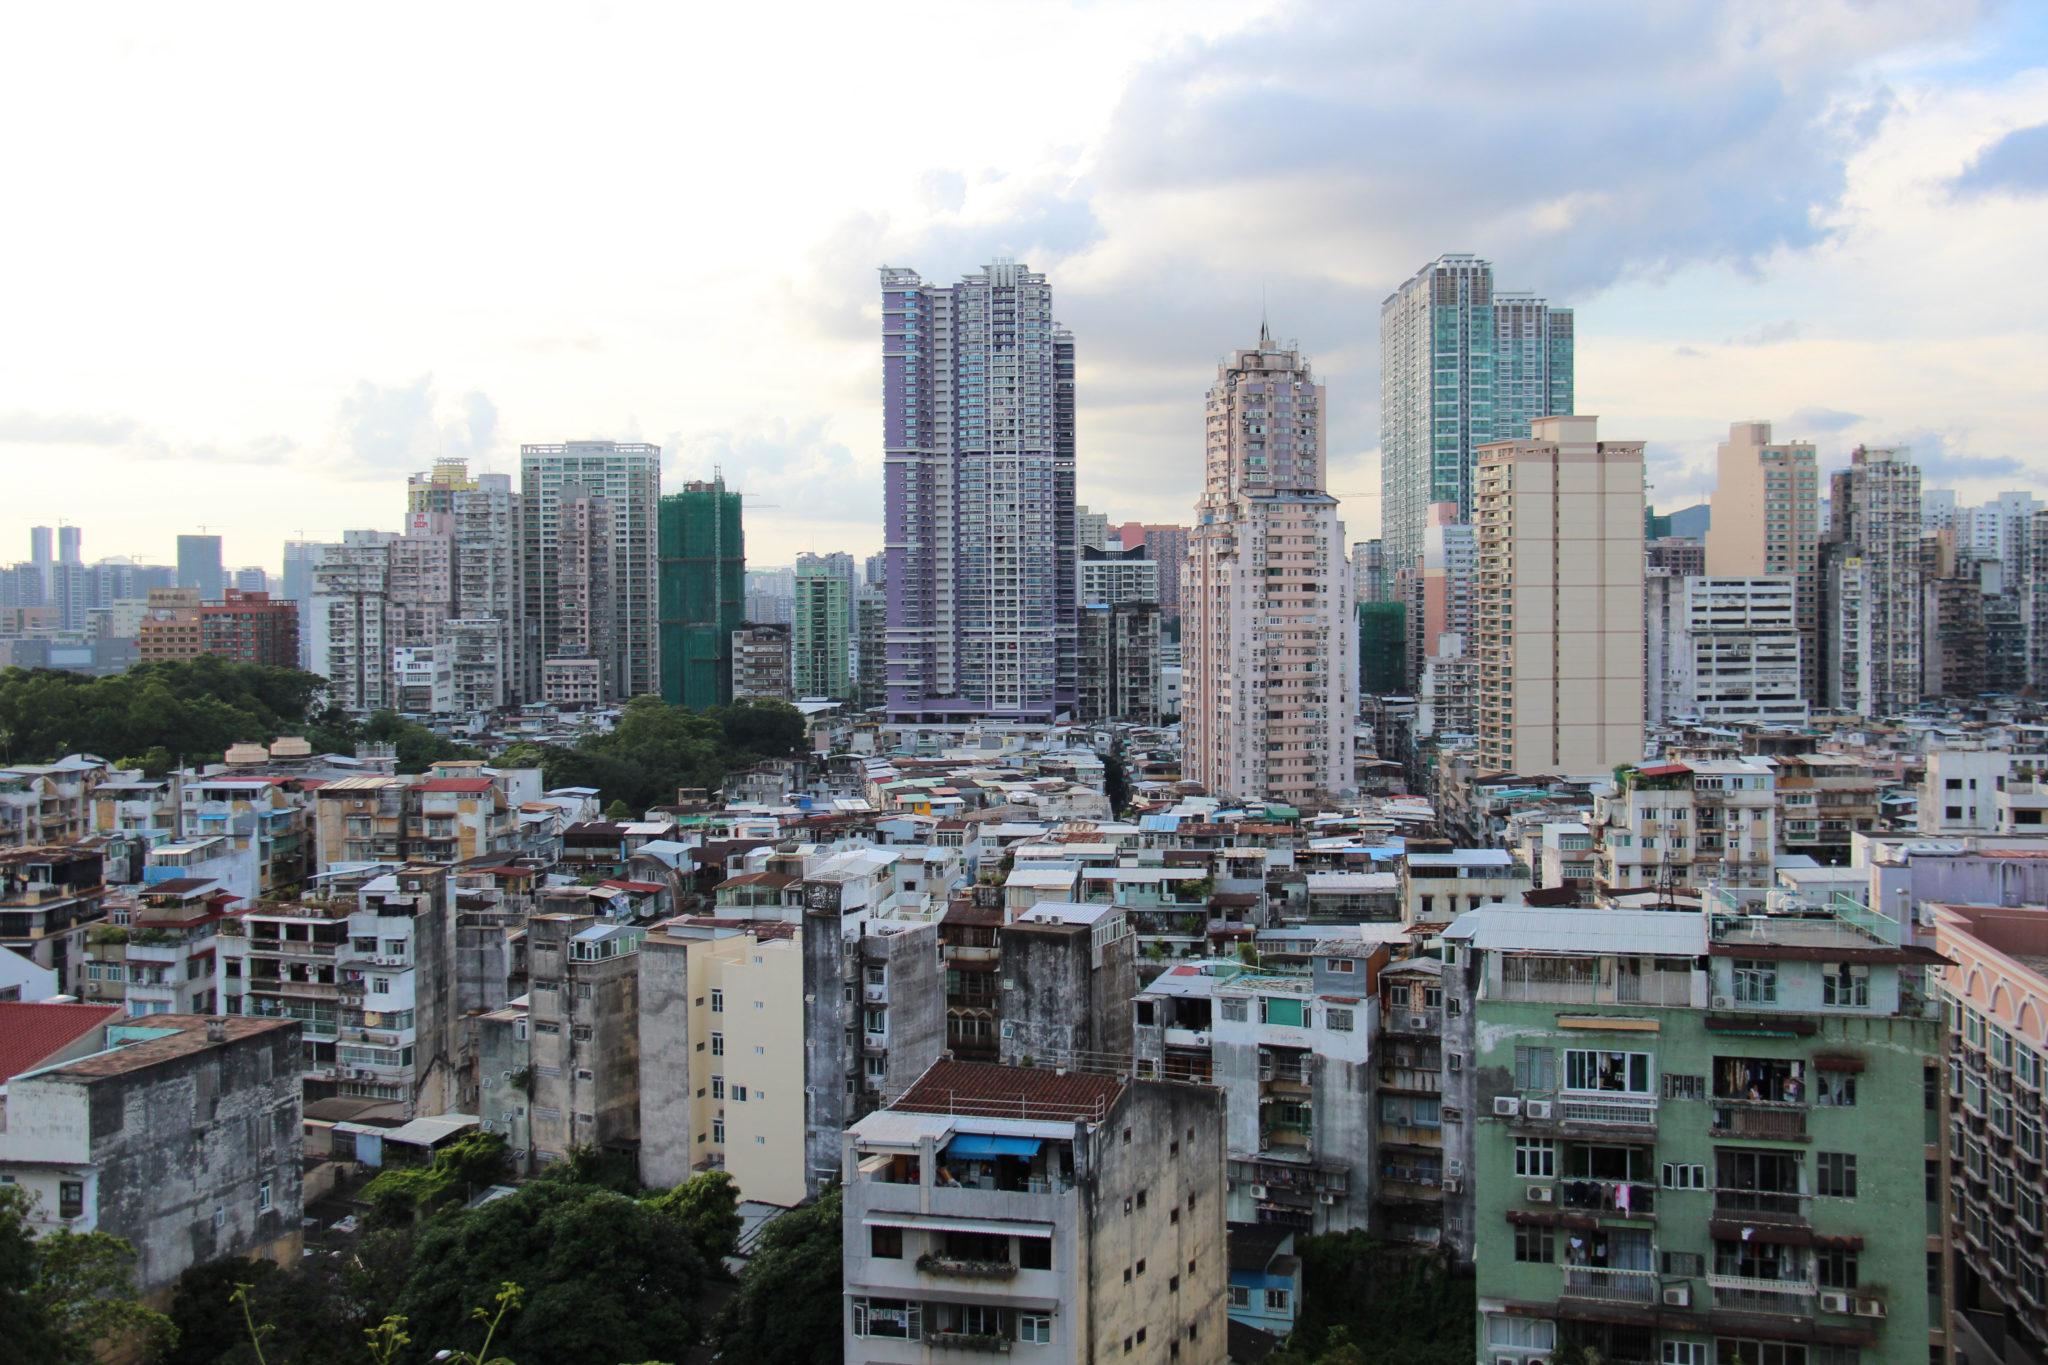 Rendas | Jurista teme que projecto de lei de Chan Meng Kam facilite despejos